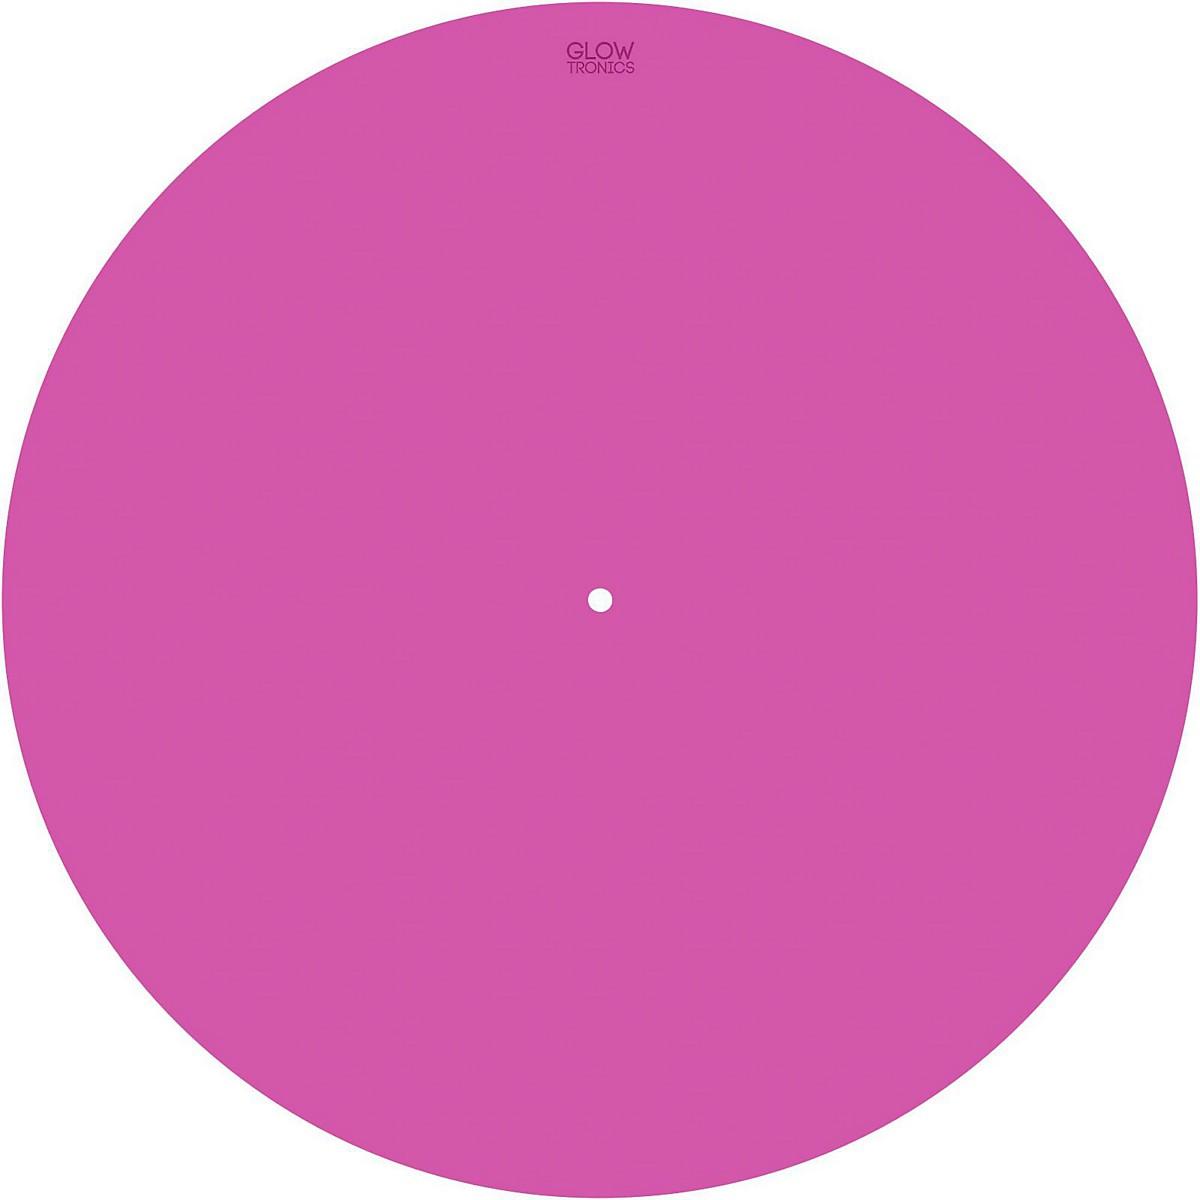 Glowtronics 12 in. UV-activated Pink Glow DJ Slipmat